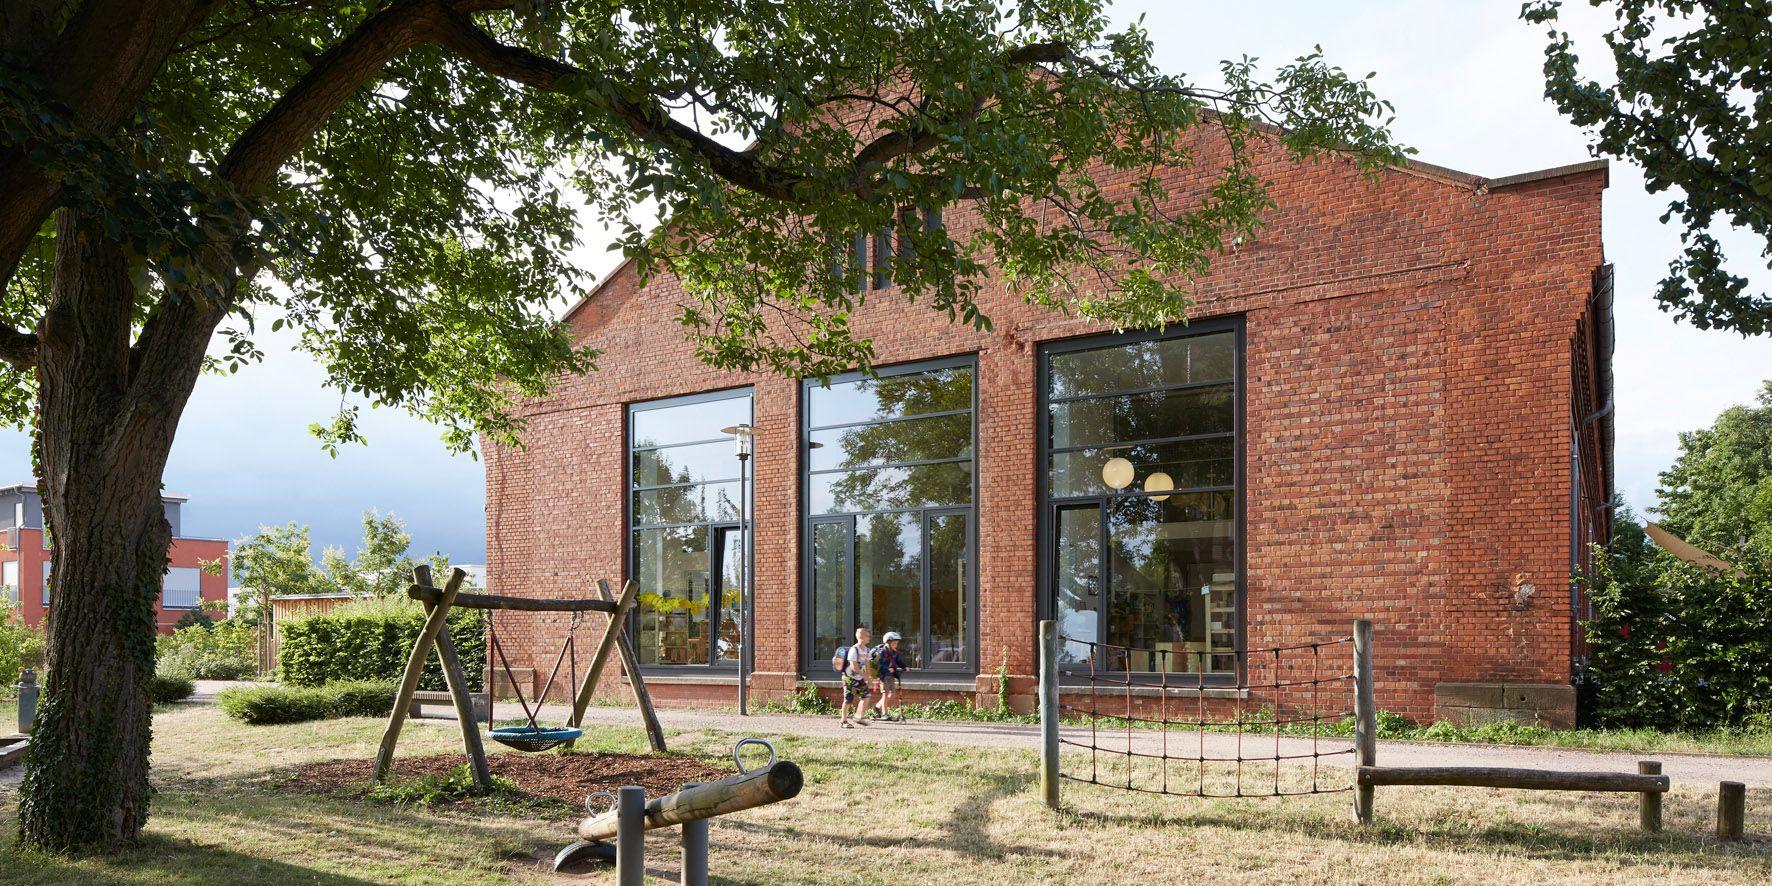 http://www.german-architects.com/de/a-sh/Projekte-3/Freie_Montessori_Schule-52900